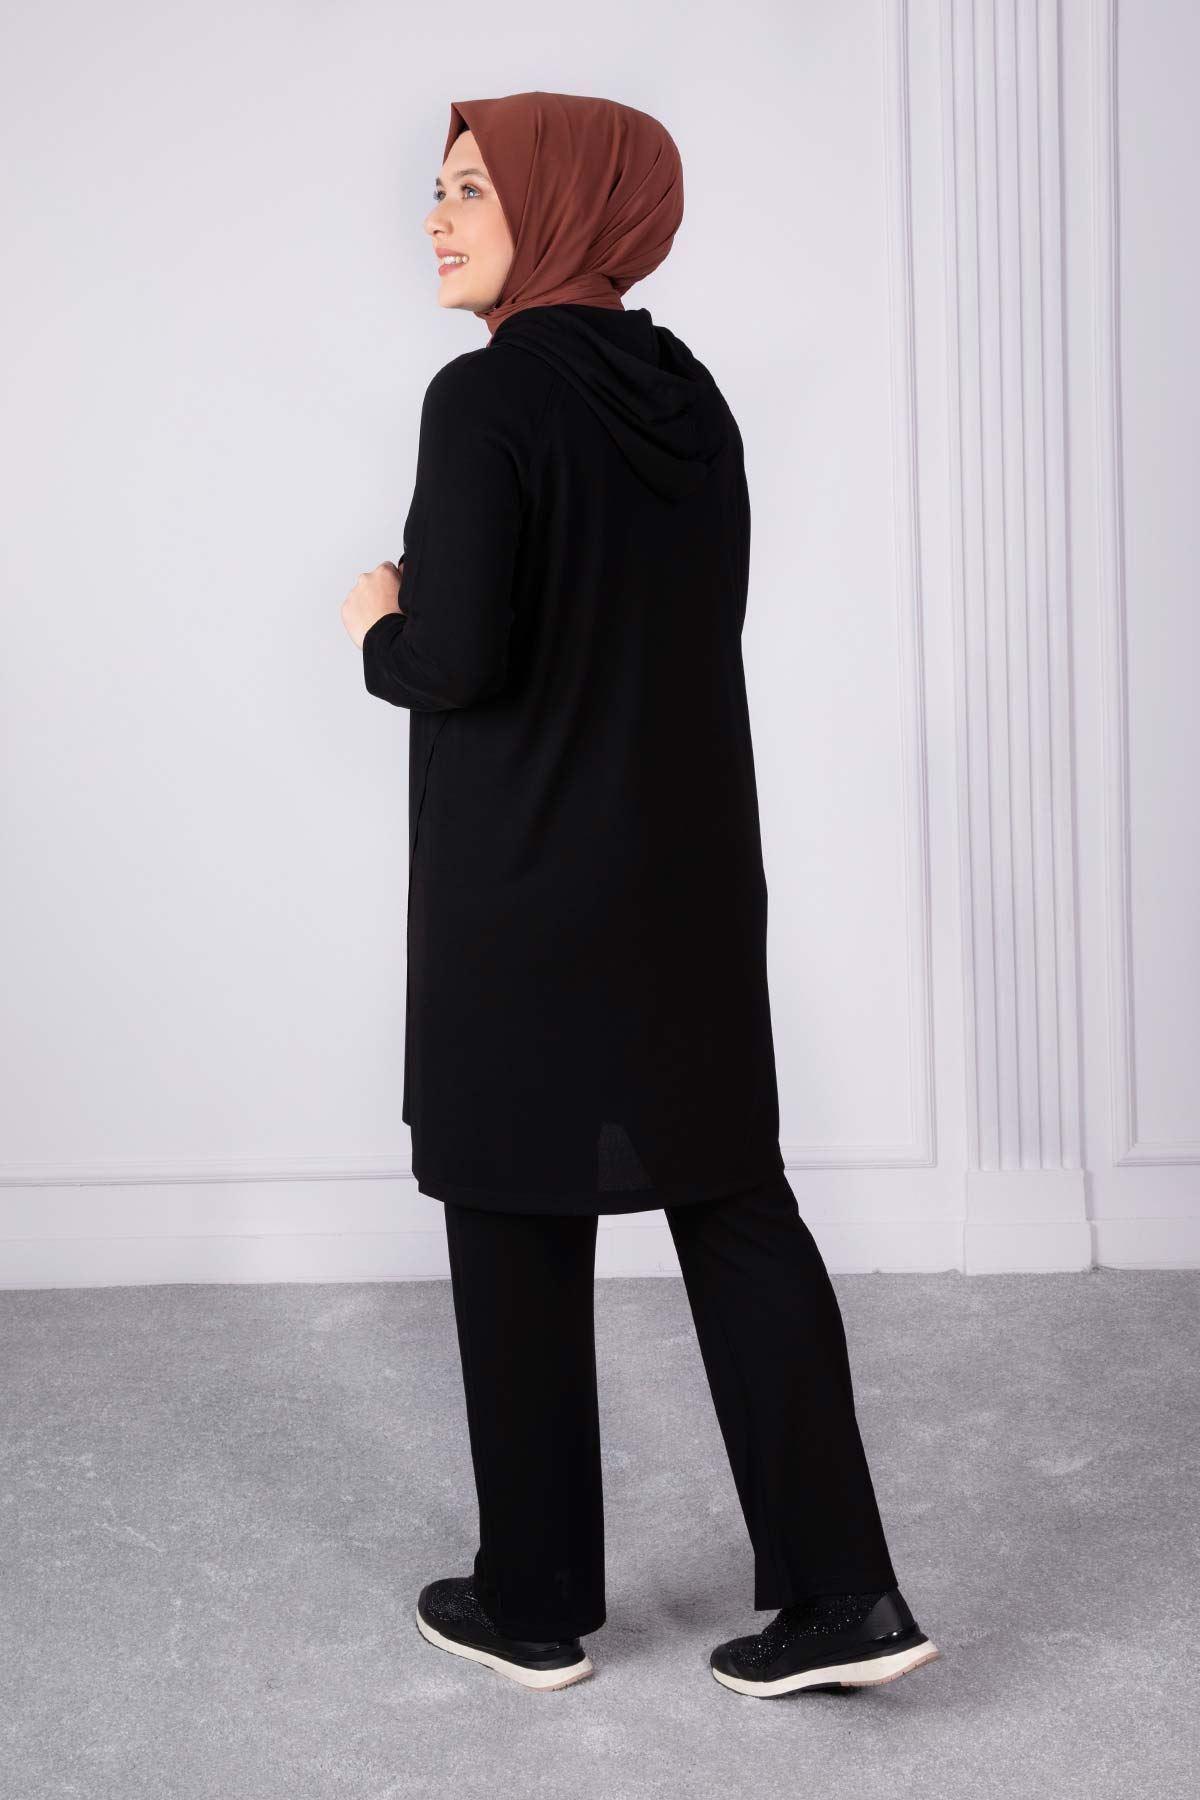 Afra Pantolonlu Takım Siyah 35008